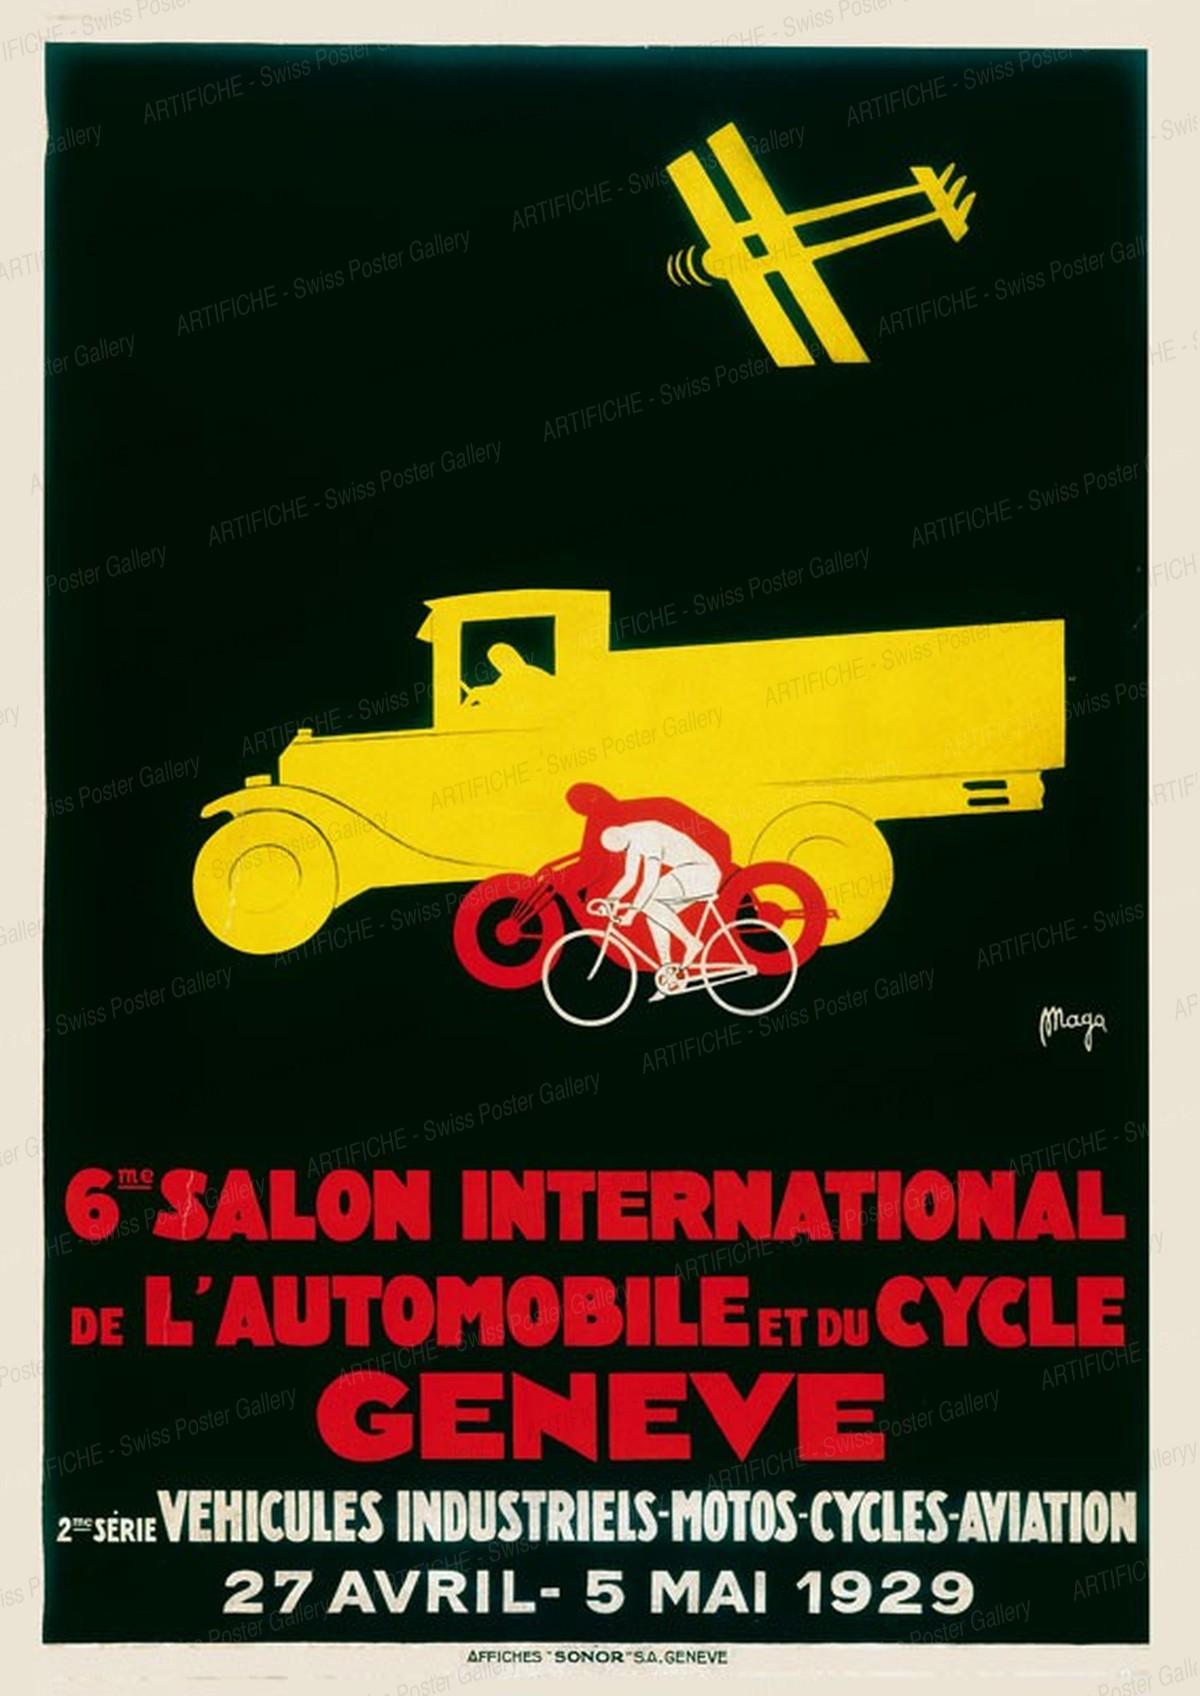 6. Internationaler Automobil- und Fahrrad-Ausstellung Genf – 2. Serie Lastwagen, Motorräder, Fahrräder, Flugzeuge 1929, Magagnoli, Giuseppe (MAGA, 1878-1933)